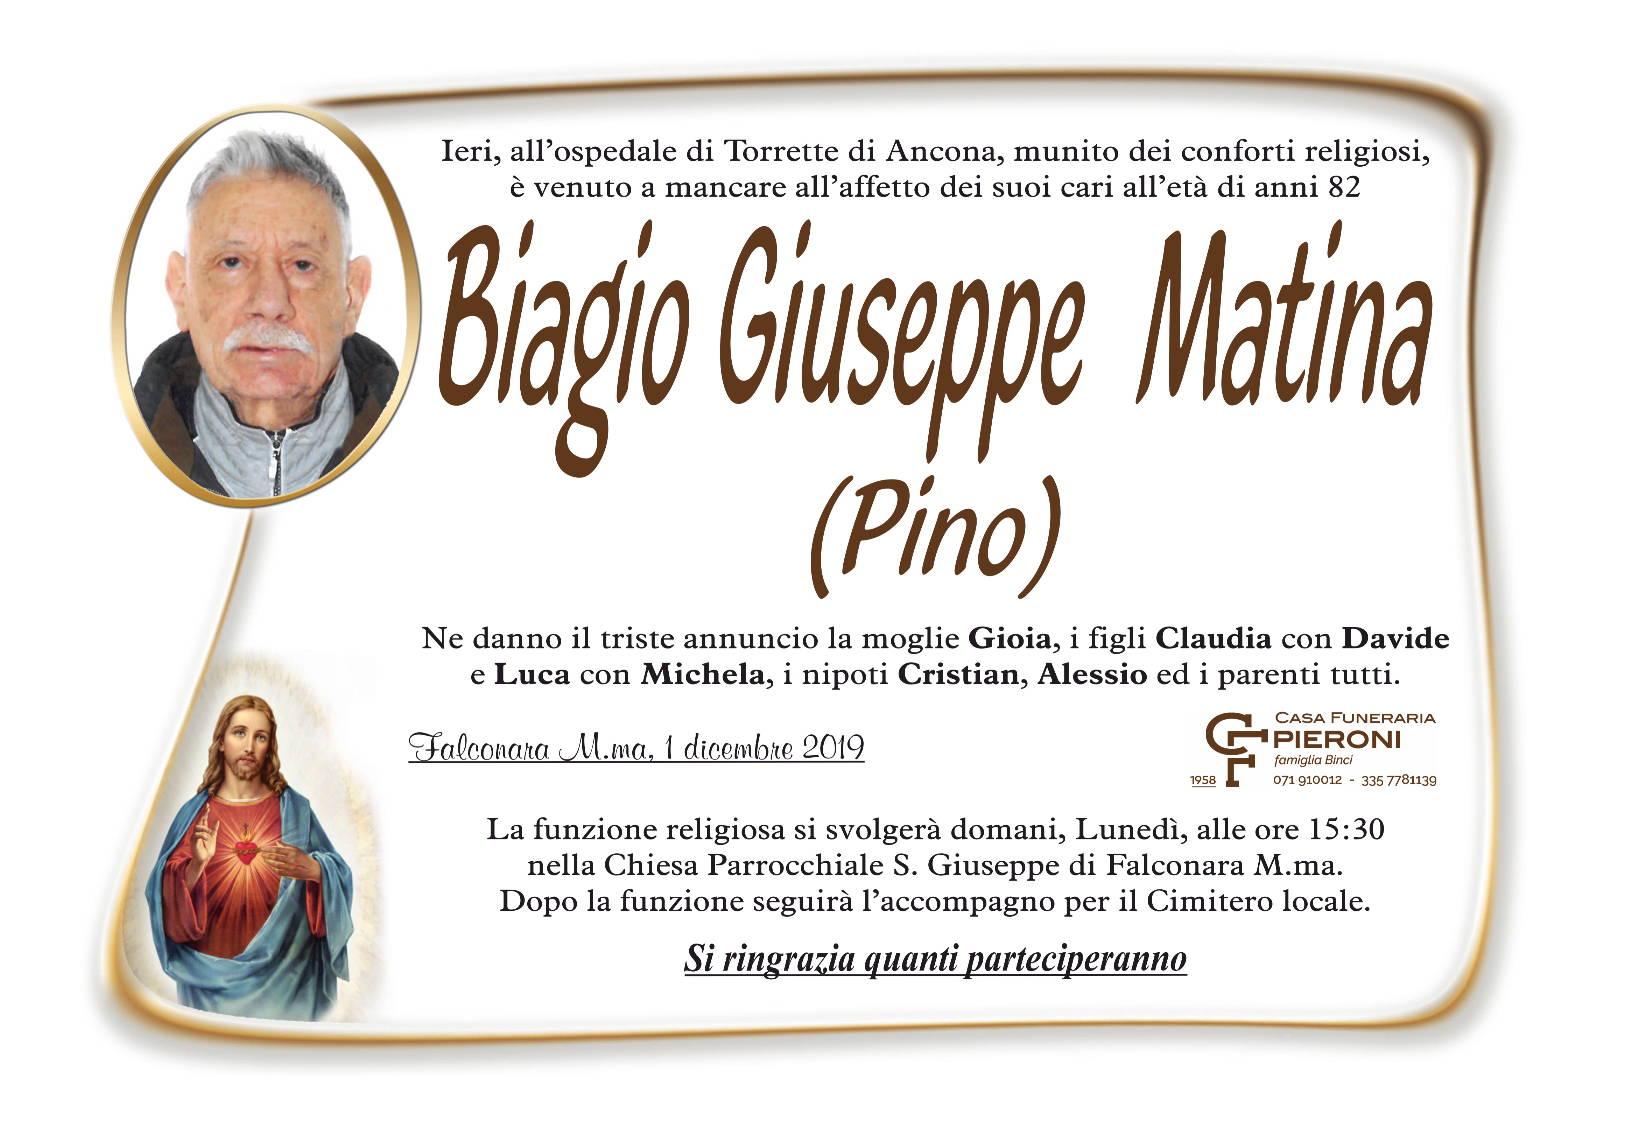 Biagio Giuseppe Matina